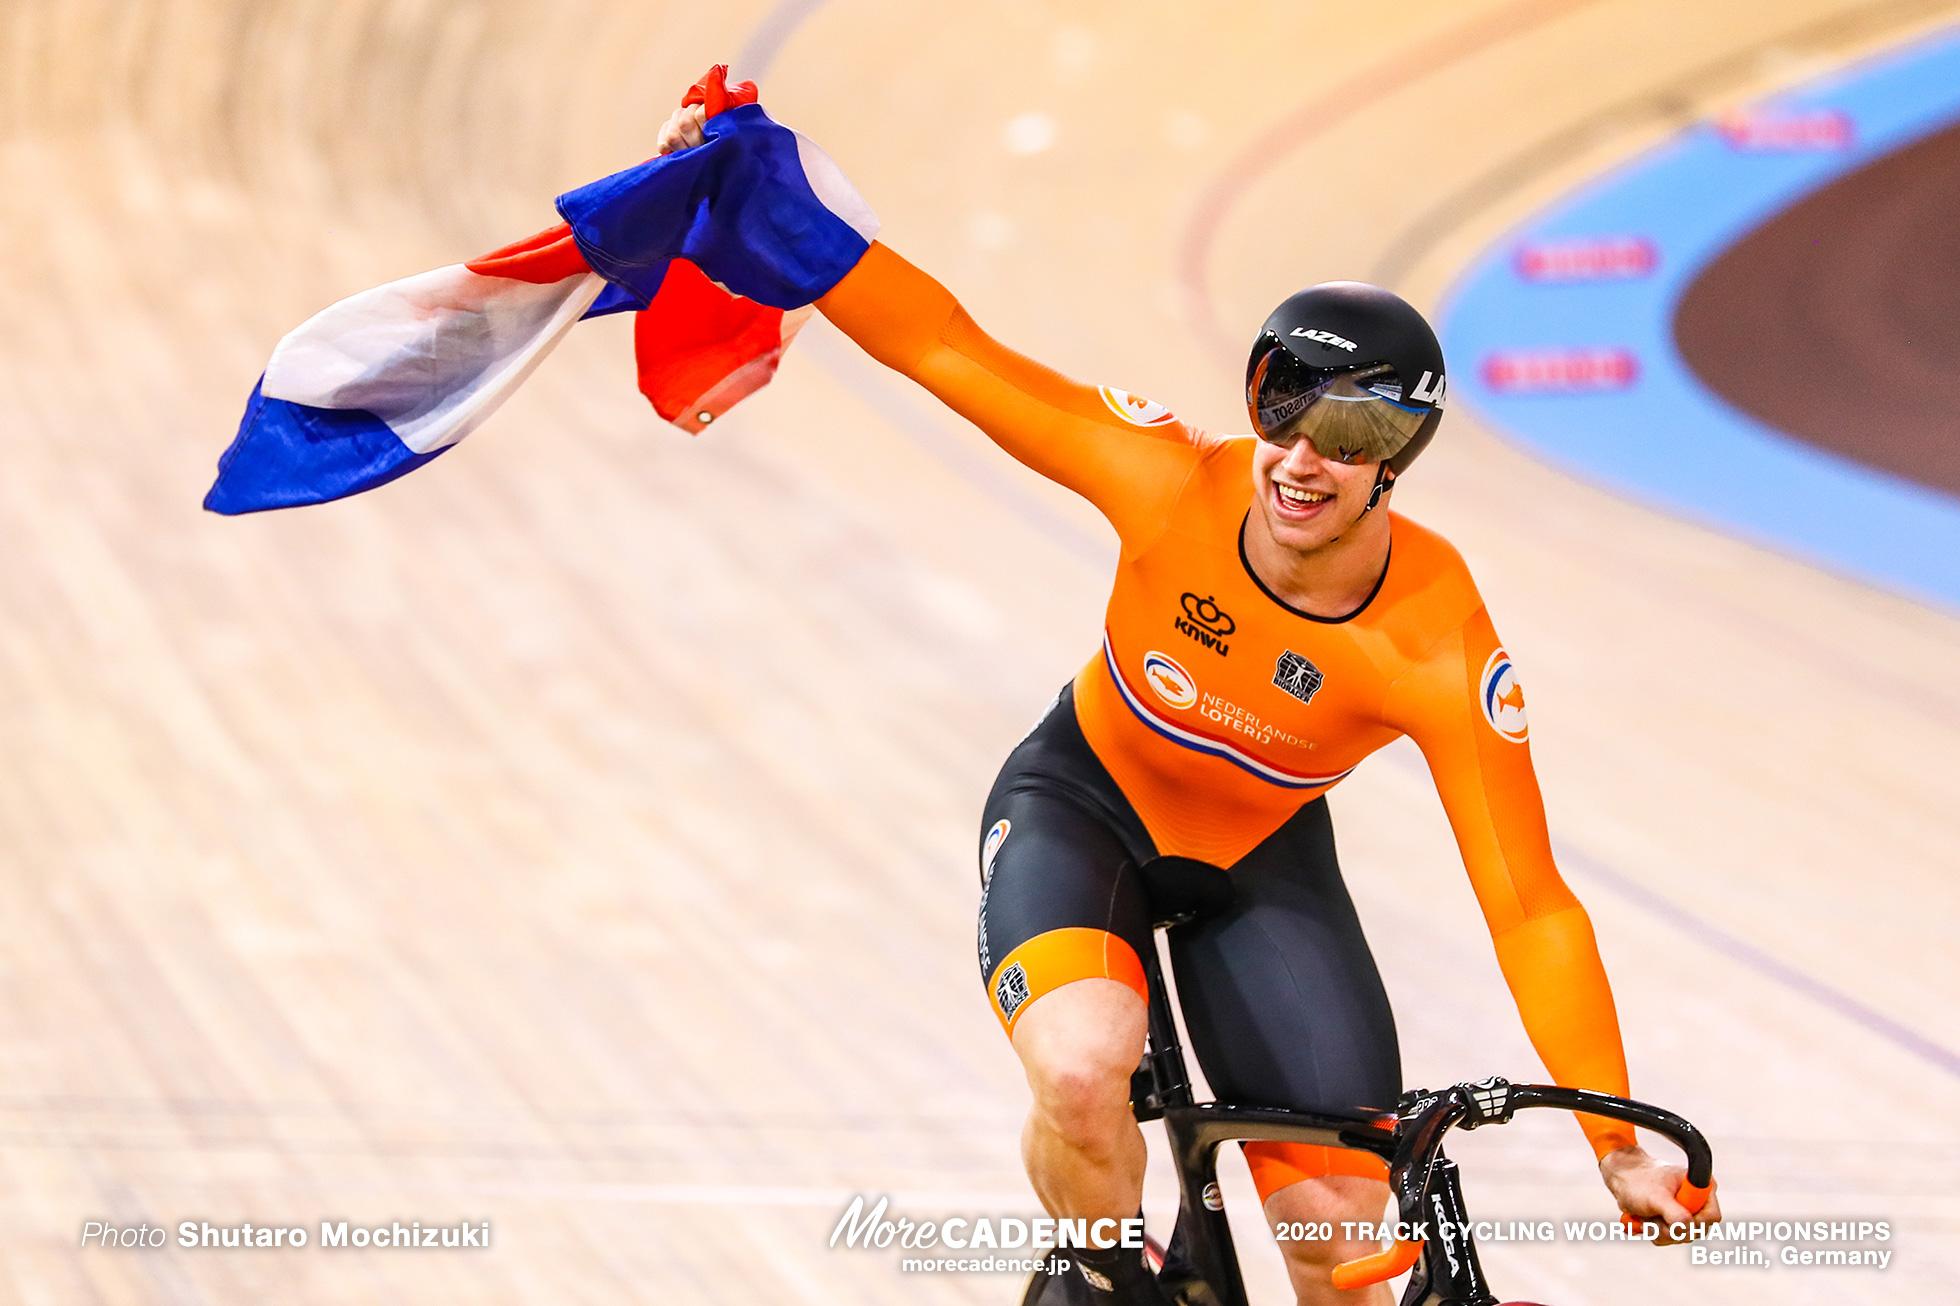 Final / Men's Keirin / 2020 Track Cycling World Championships, ハリー・ラブレイセン Harrie Lavreysen